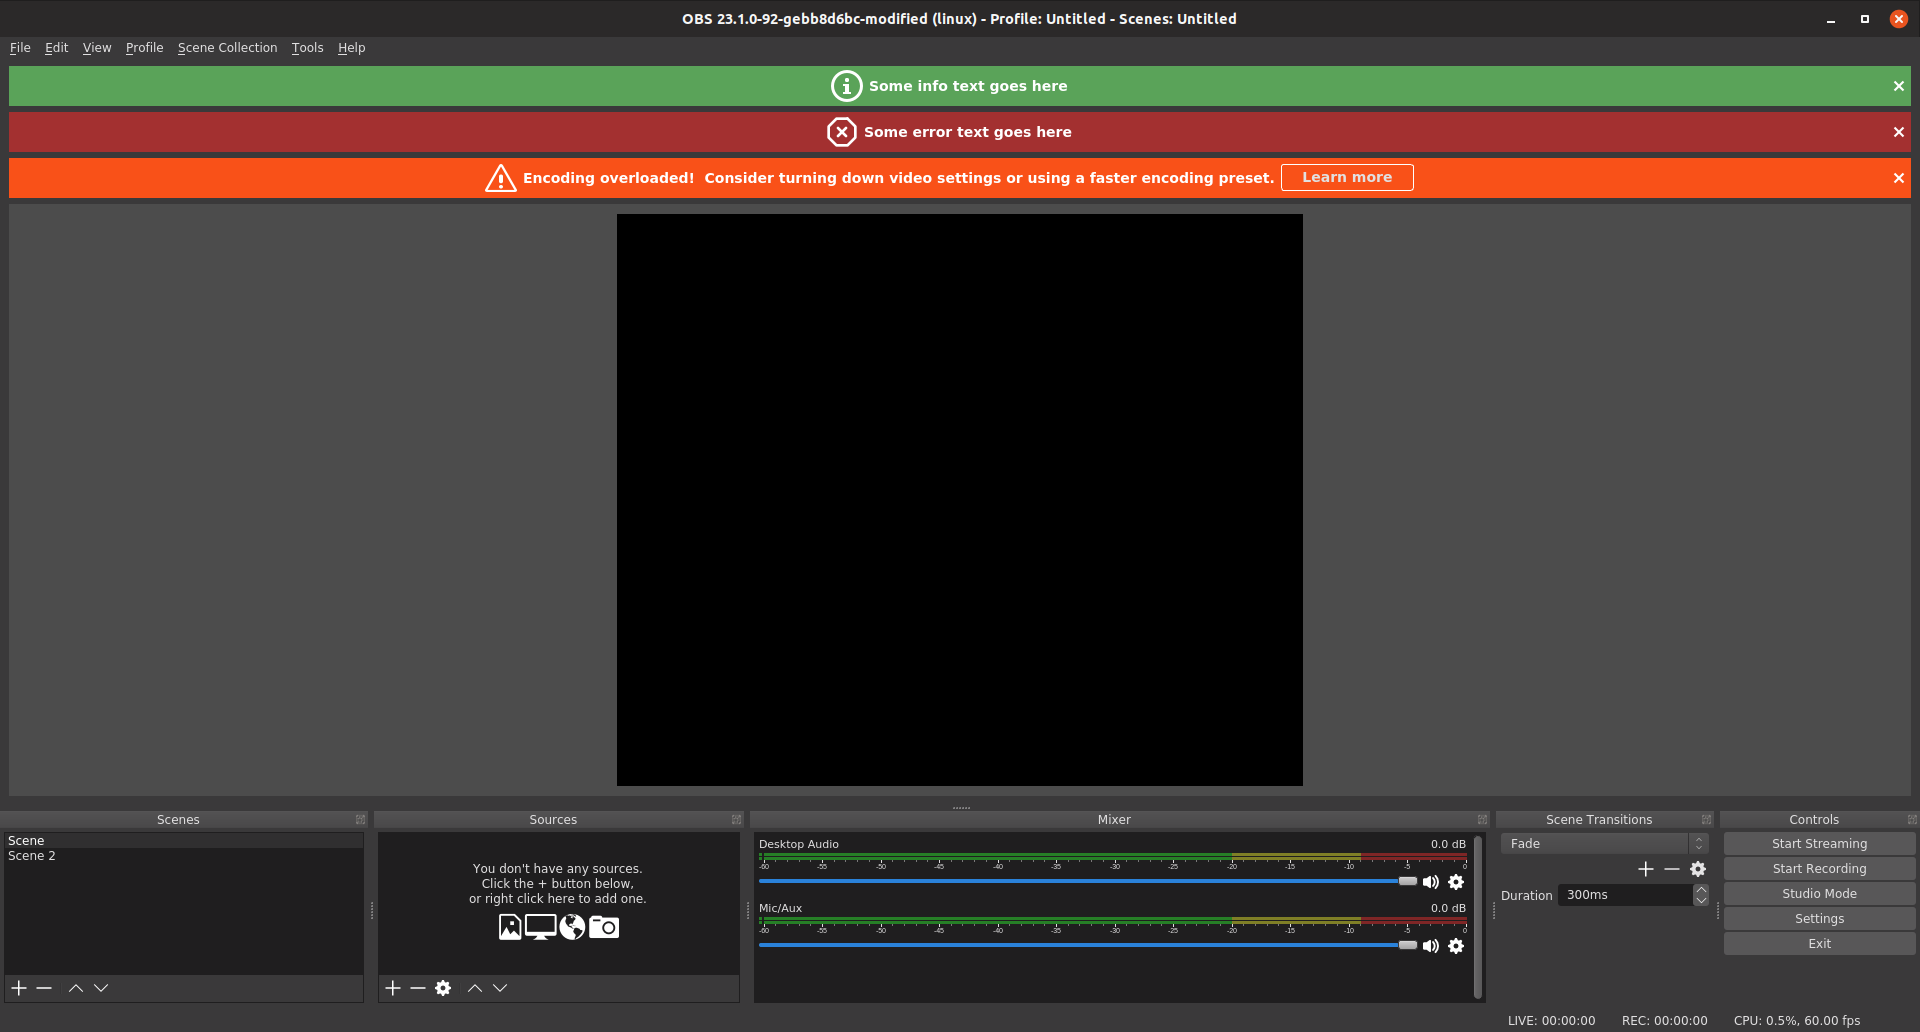 Desktop Audio Obs